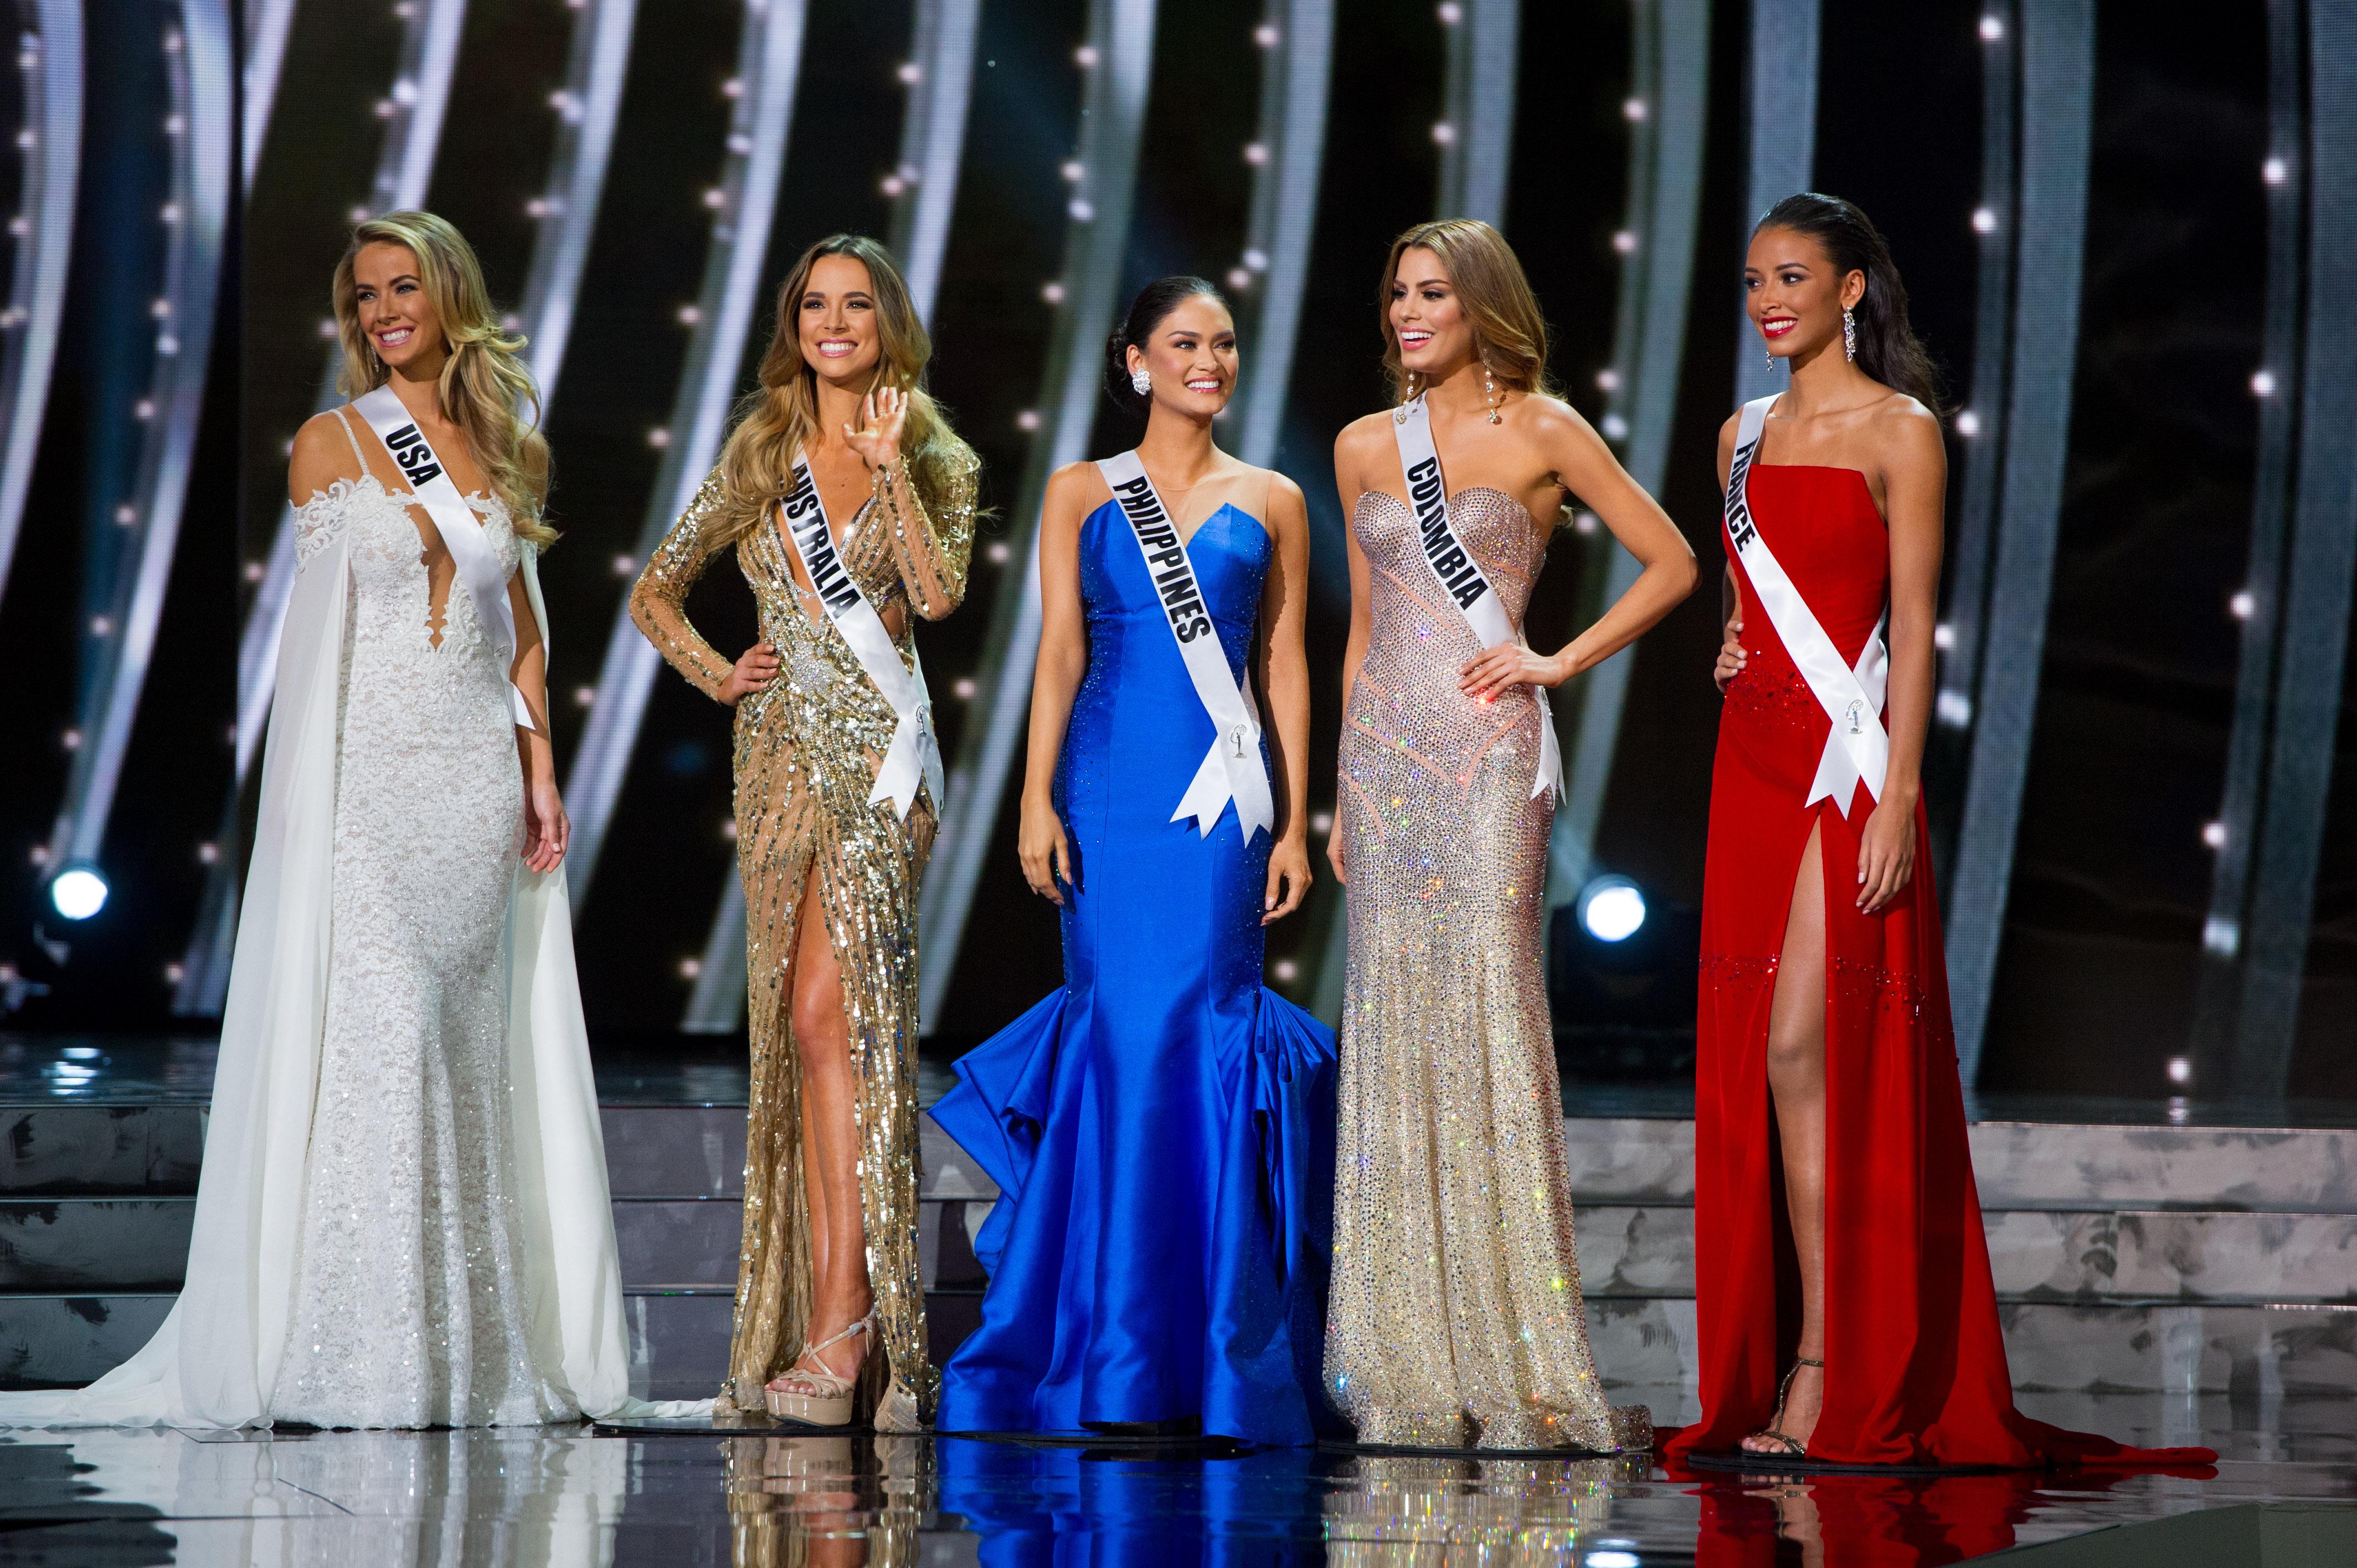 Archivo:Miss Universe 2008, top 5.JPG - Wikipedia, la